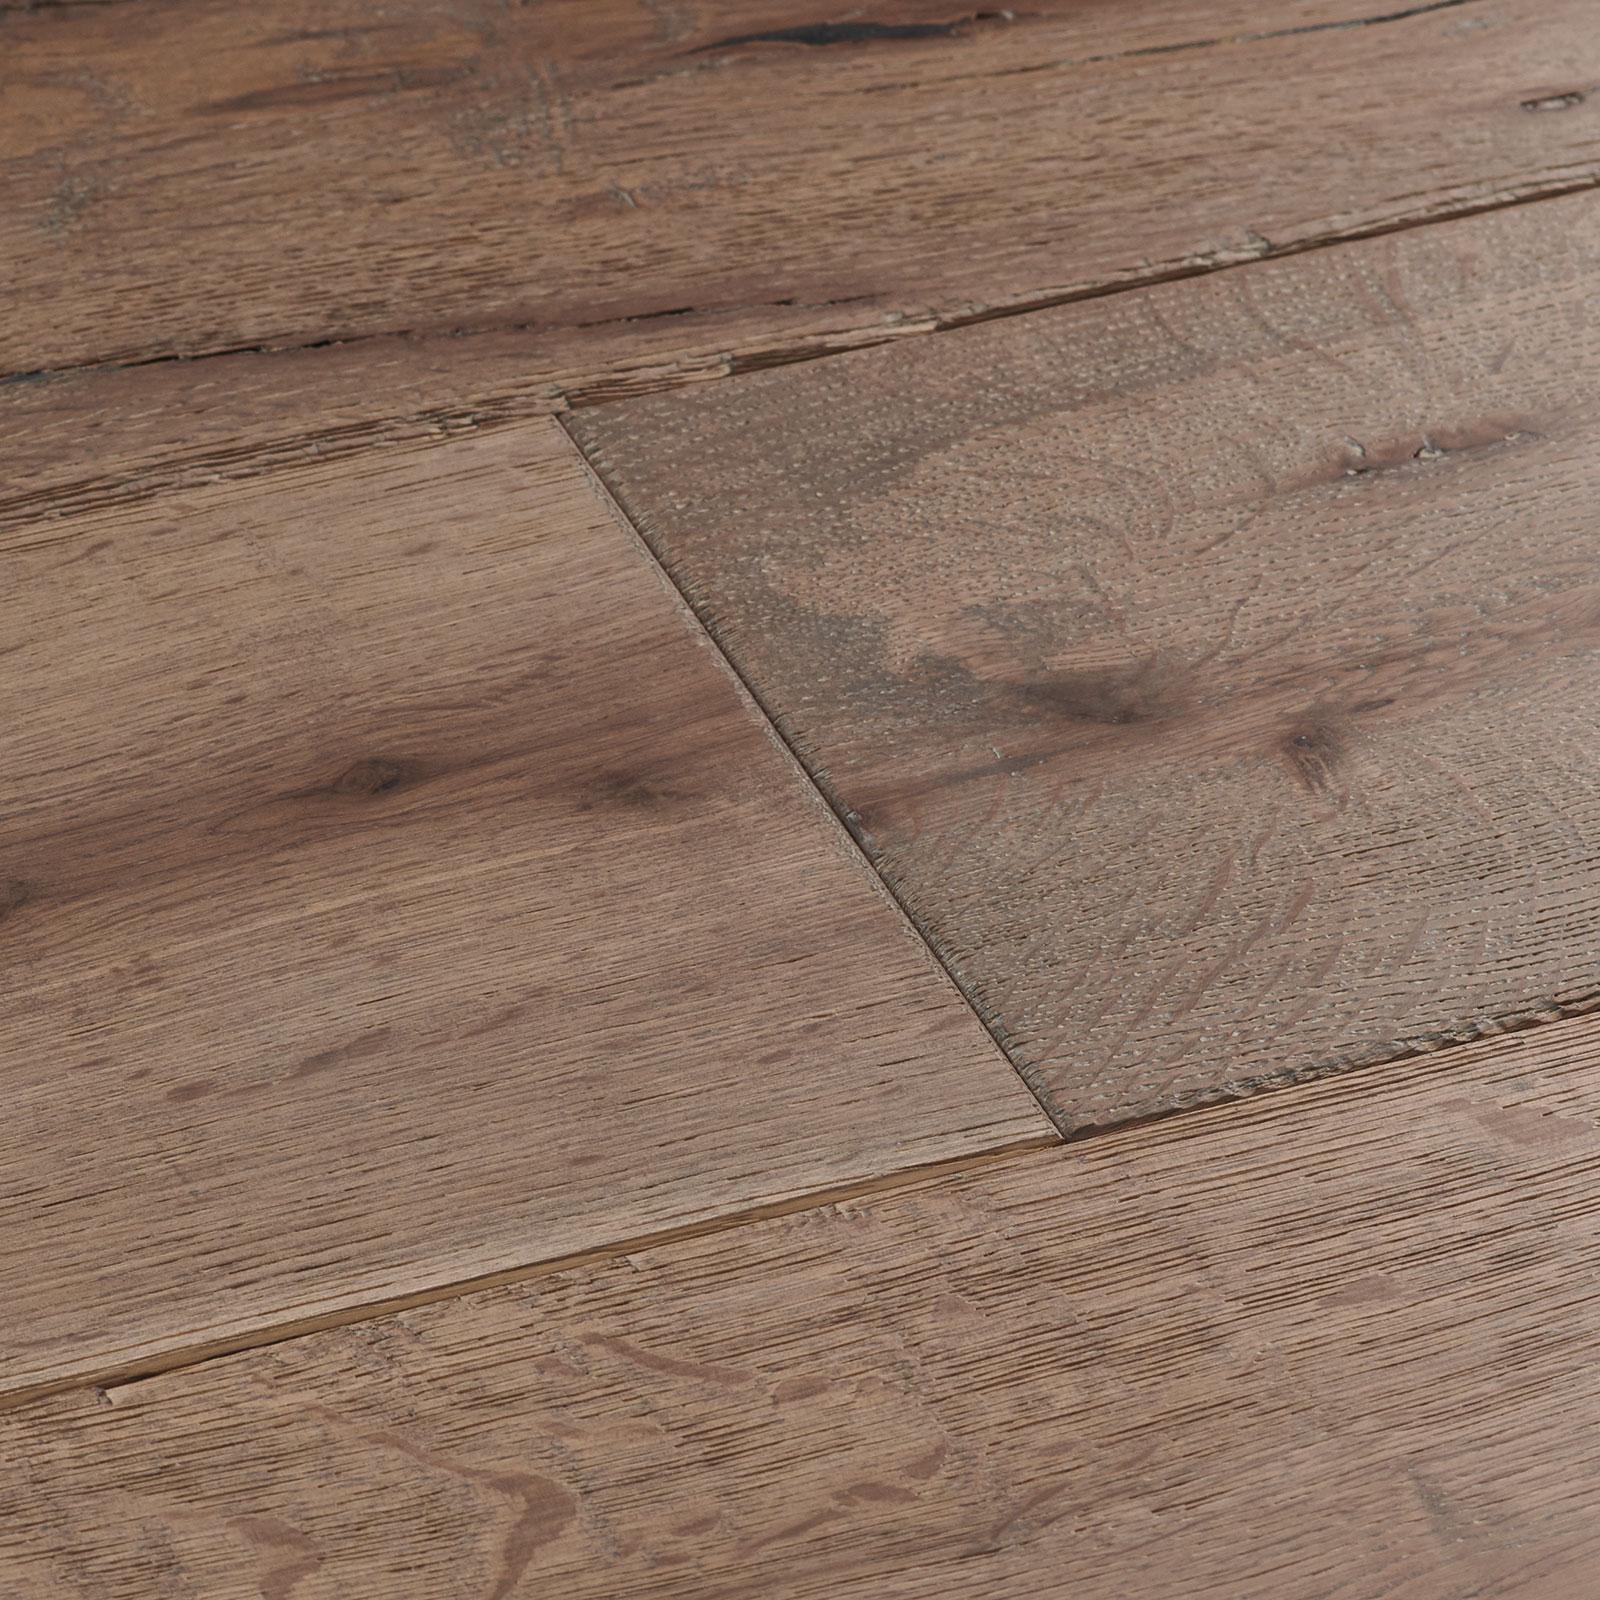 Engineered wood flooring Berkeley Calico